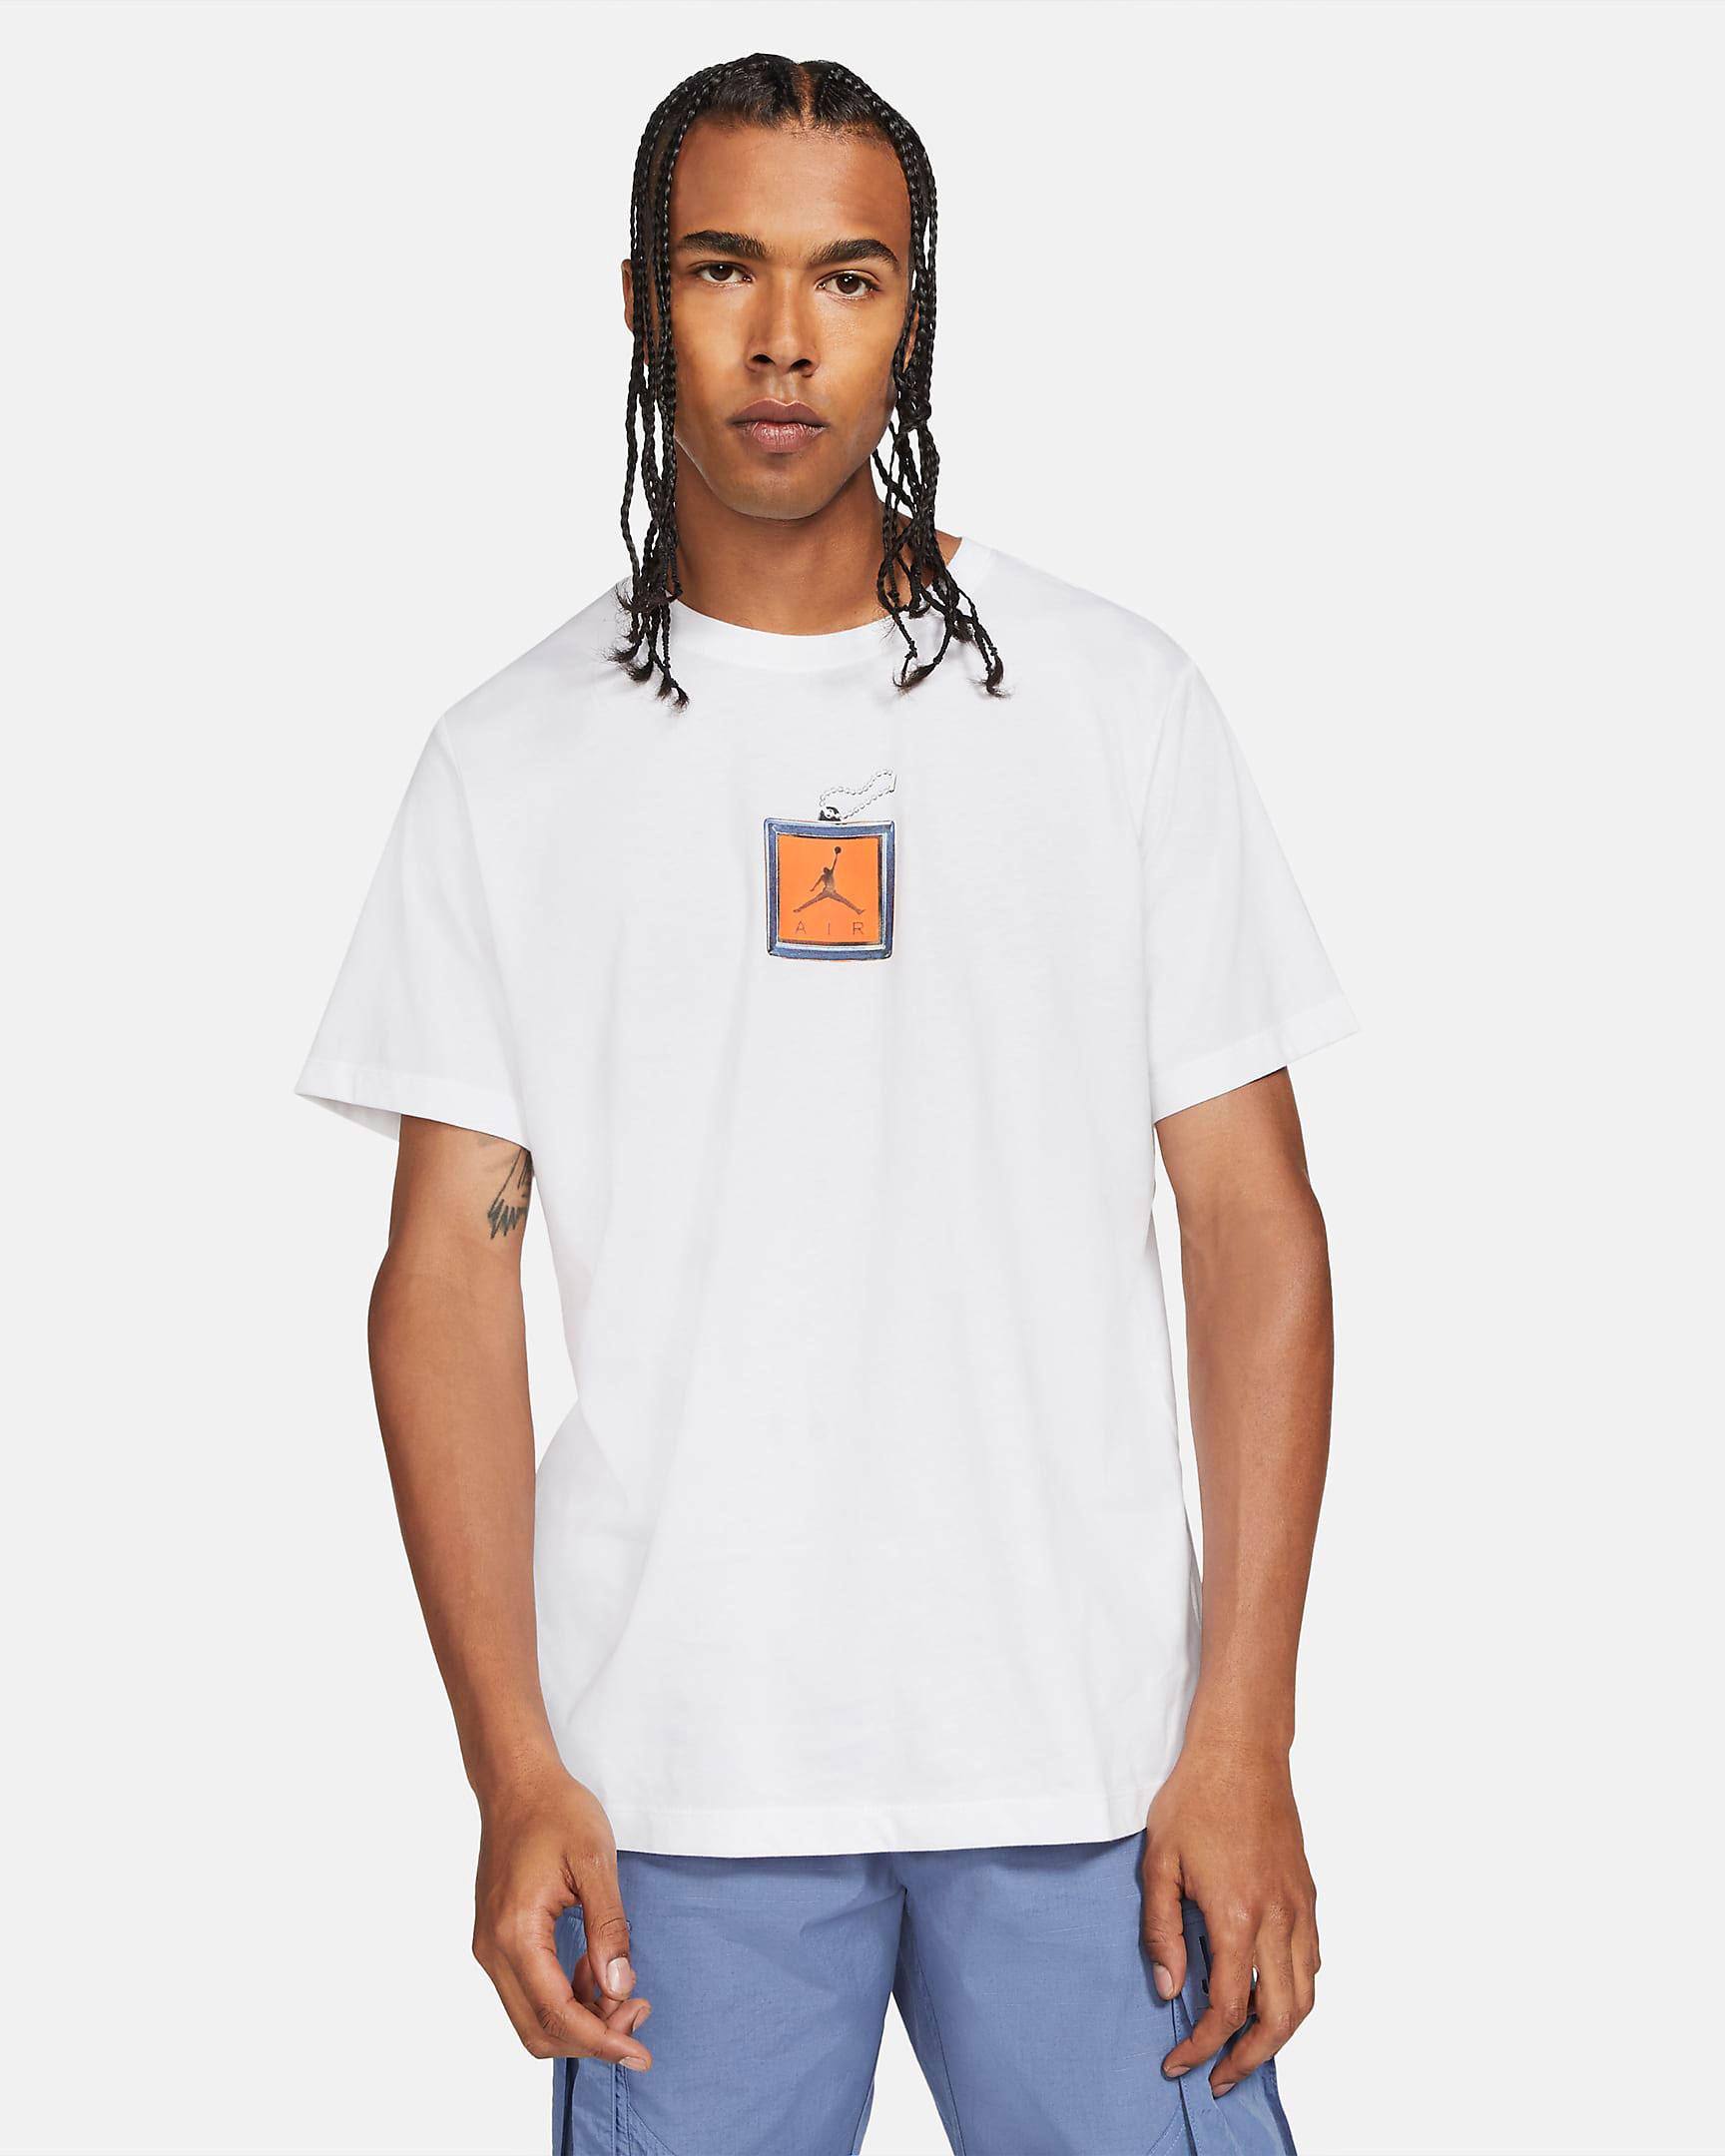 air-jordan-11-low-bright-citrus-shirt-match-1